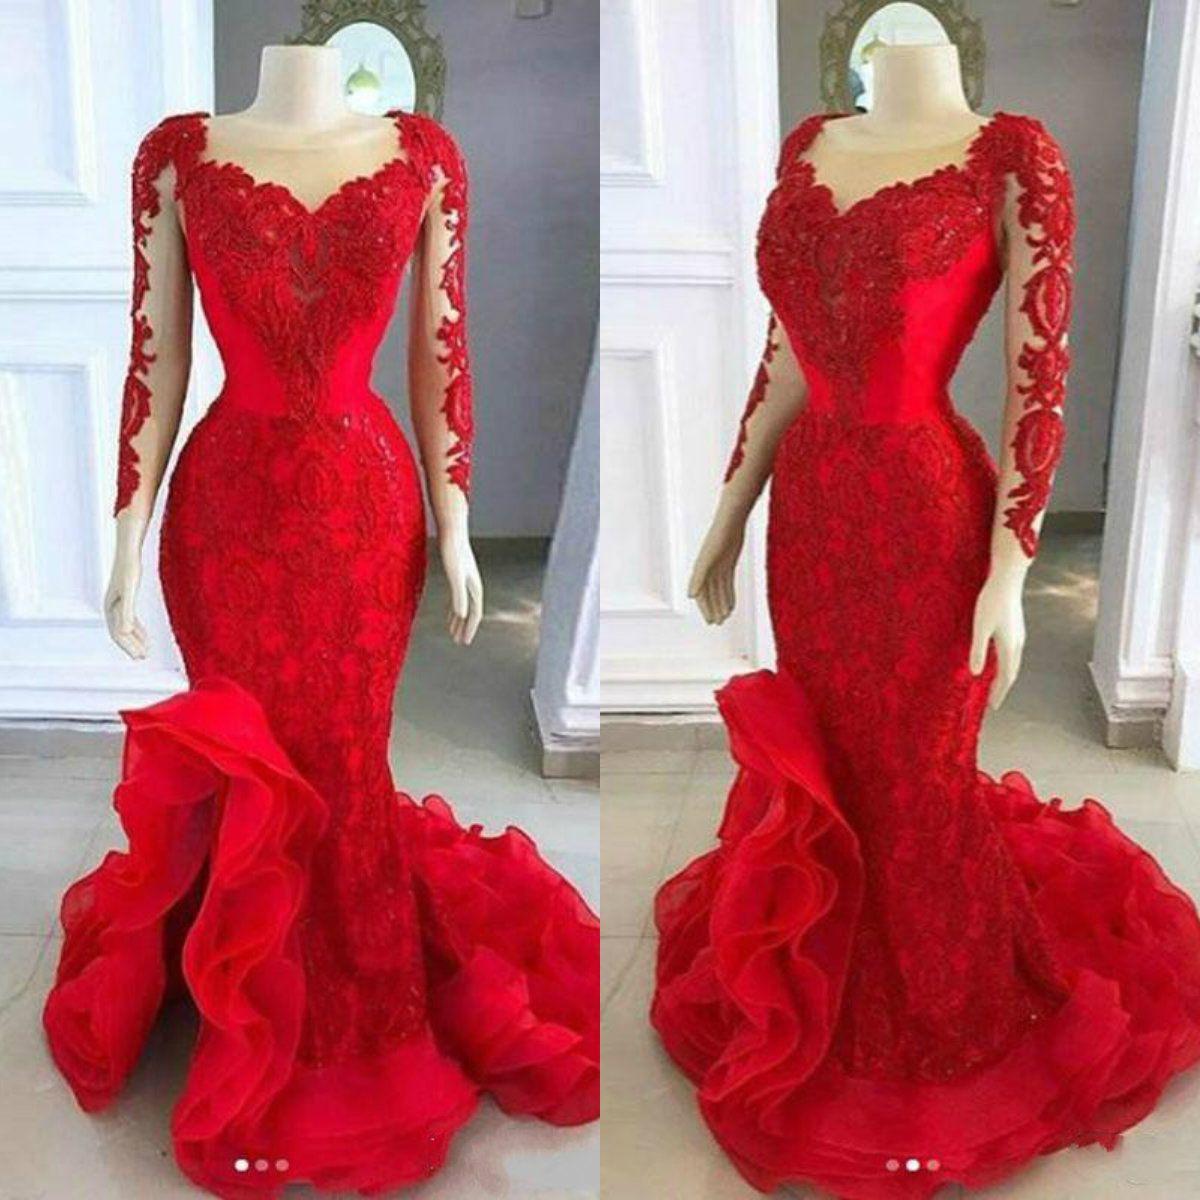 Elegante sirena roja vestidos de noche sheer cuello encaje apliqueado manga larga vestido de fiesta baja split sweep tren árabe formal fiesta de fiesta